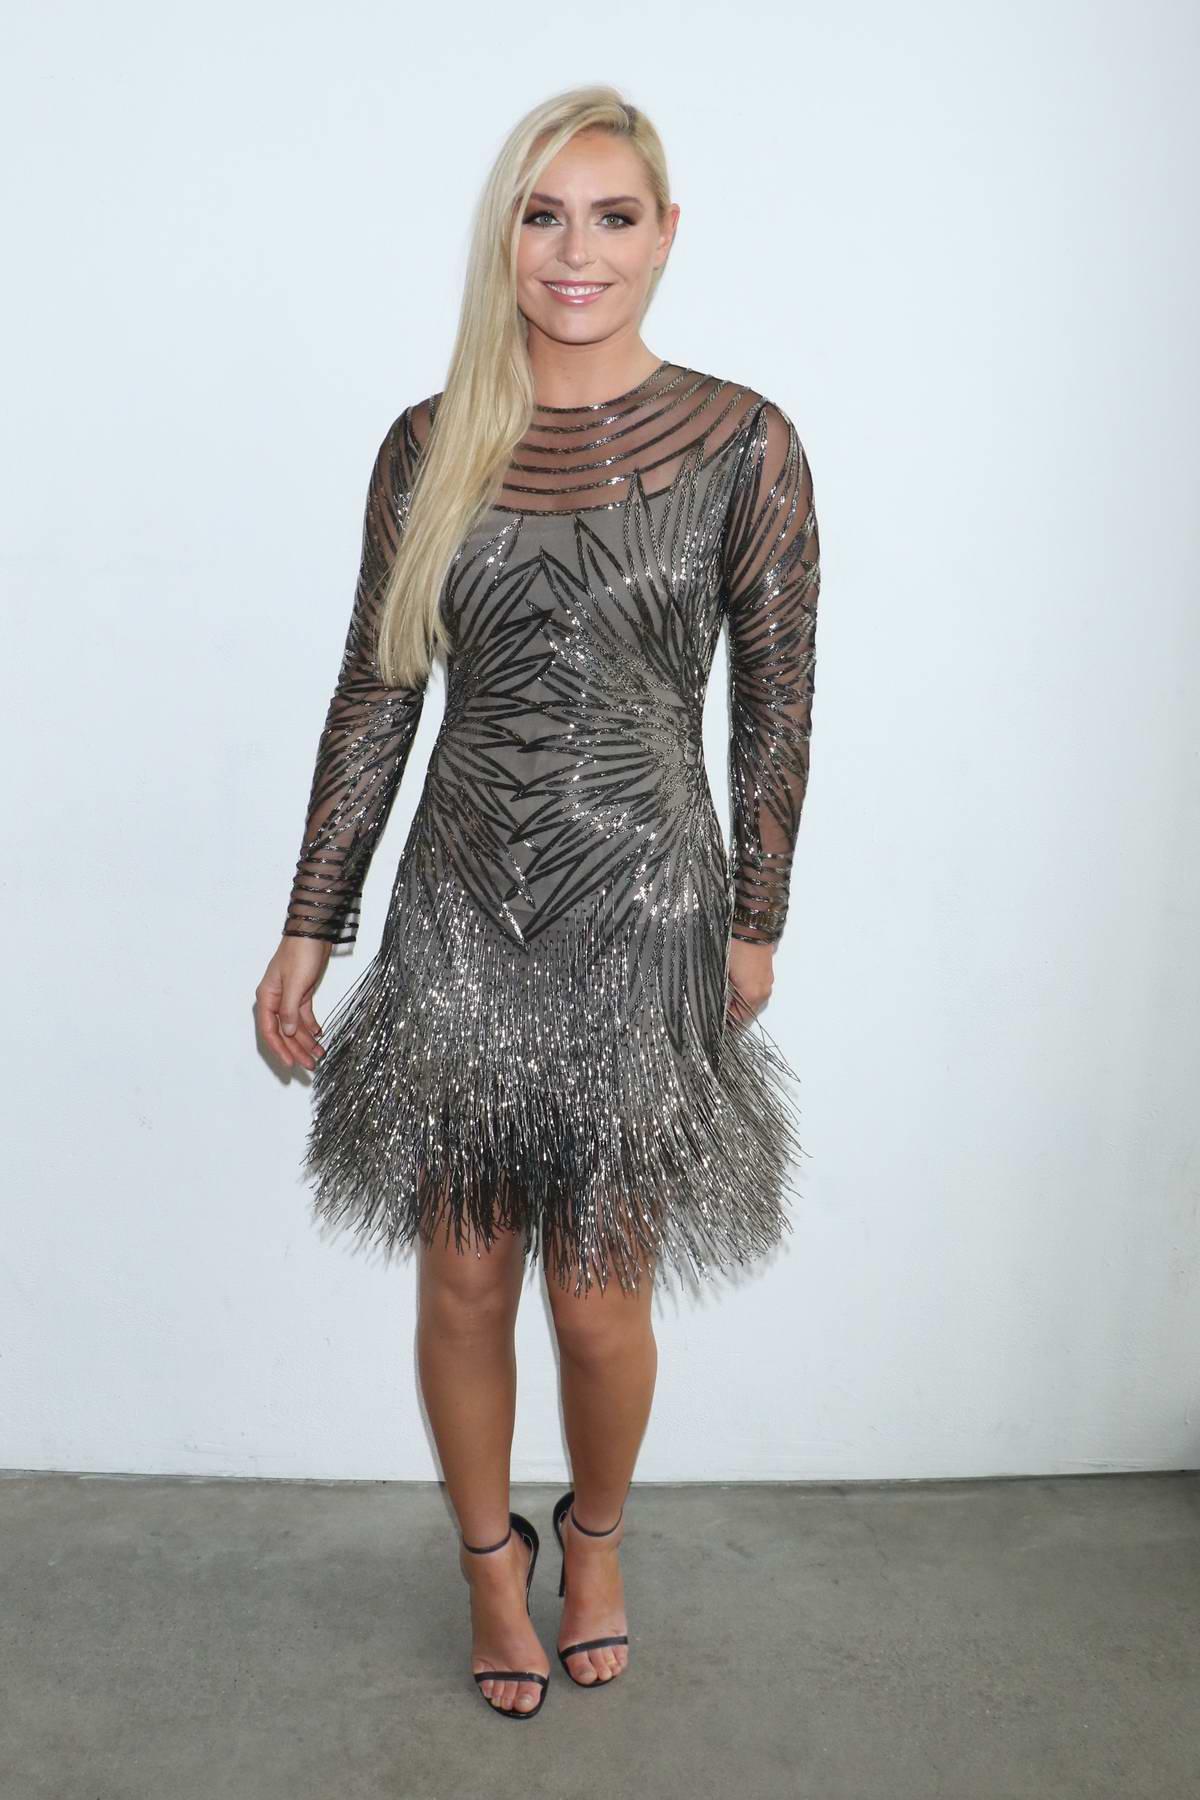 Lindsey Vonn attends Naeem Khan show during New York Fashion Week in New York City